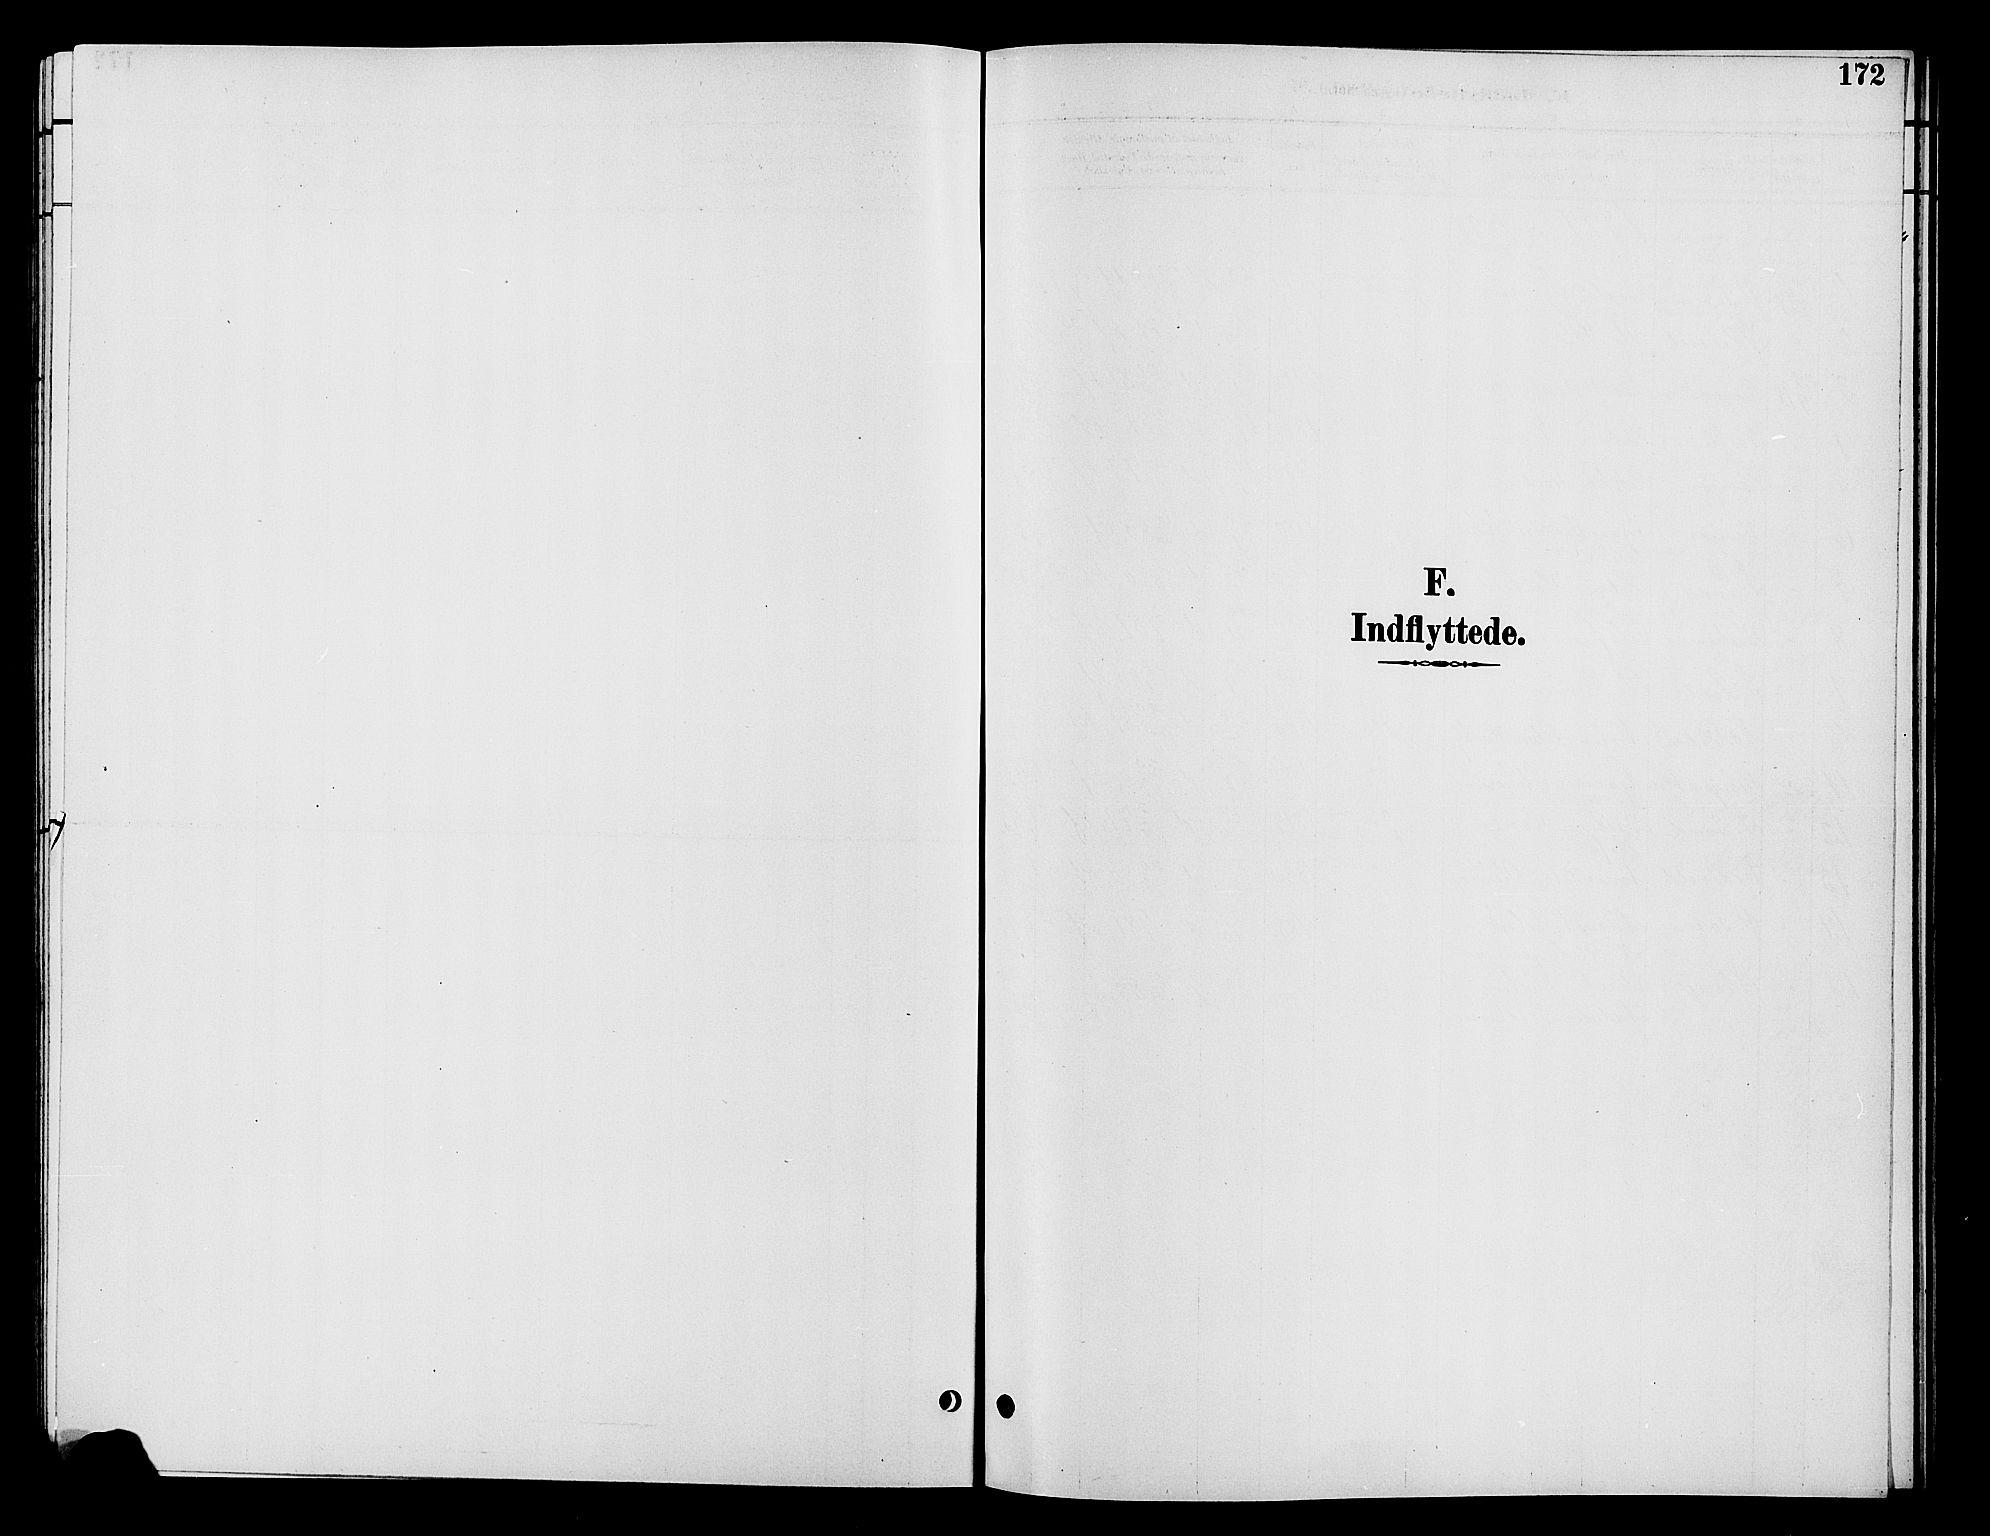 SAH, Vardal prestekontor, H/Ha/Hab/L0009: Klokkerbok nr. 9, 1894-1902, s. 172